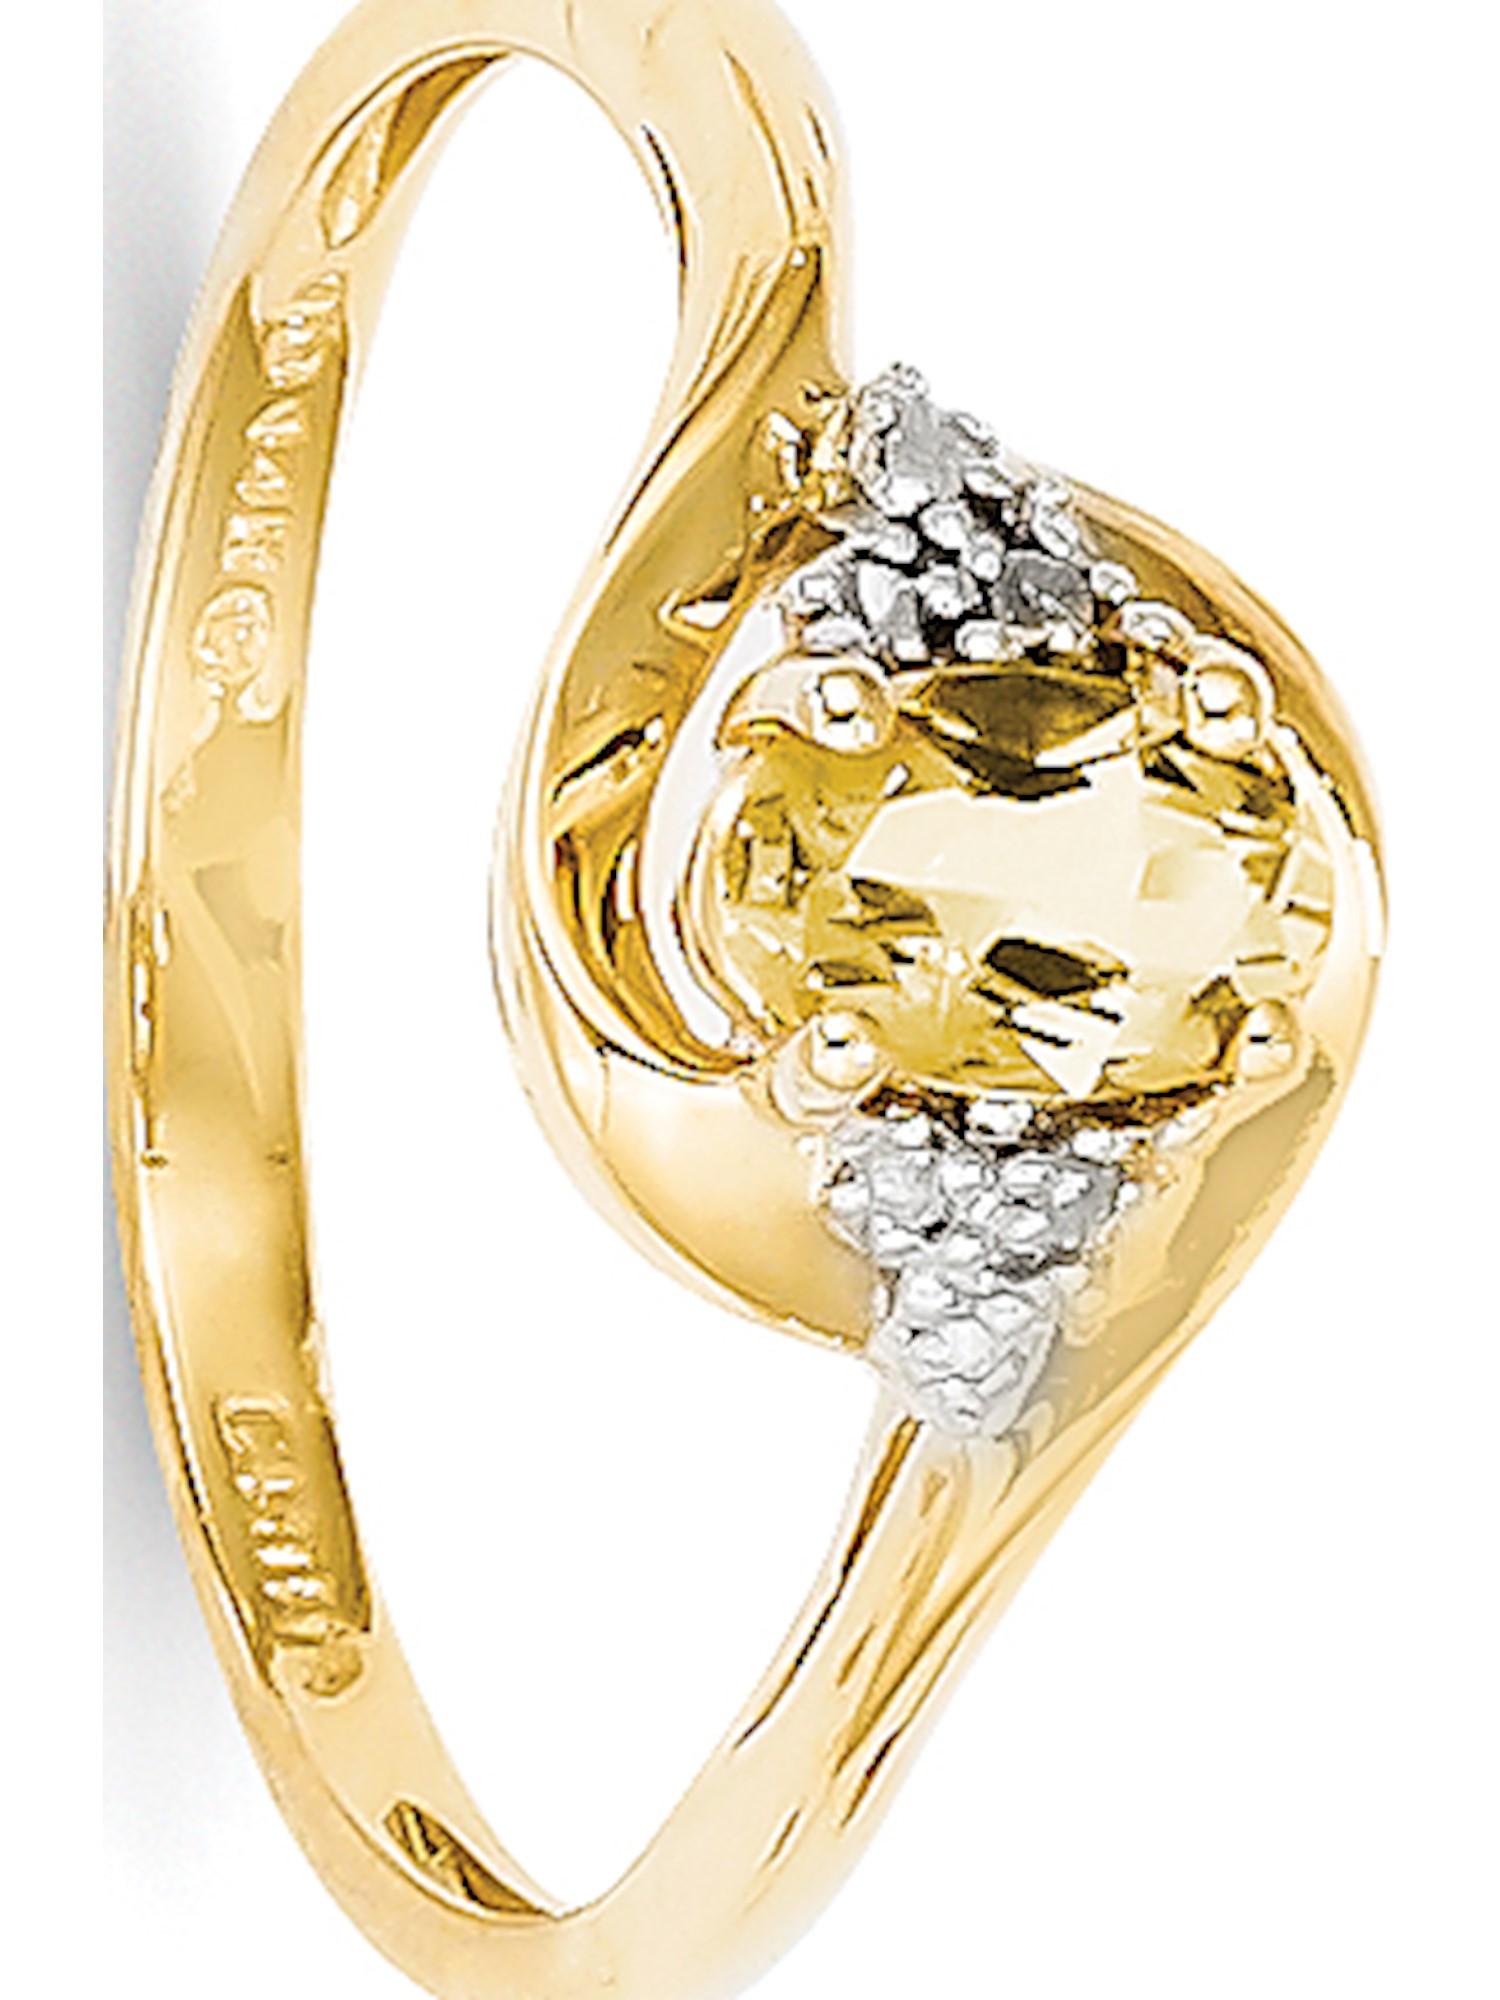 14k Yellow Gold Diamond & Citrine Ring by